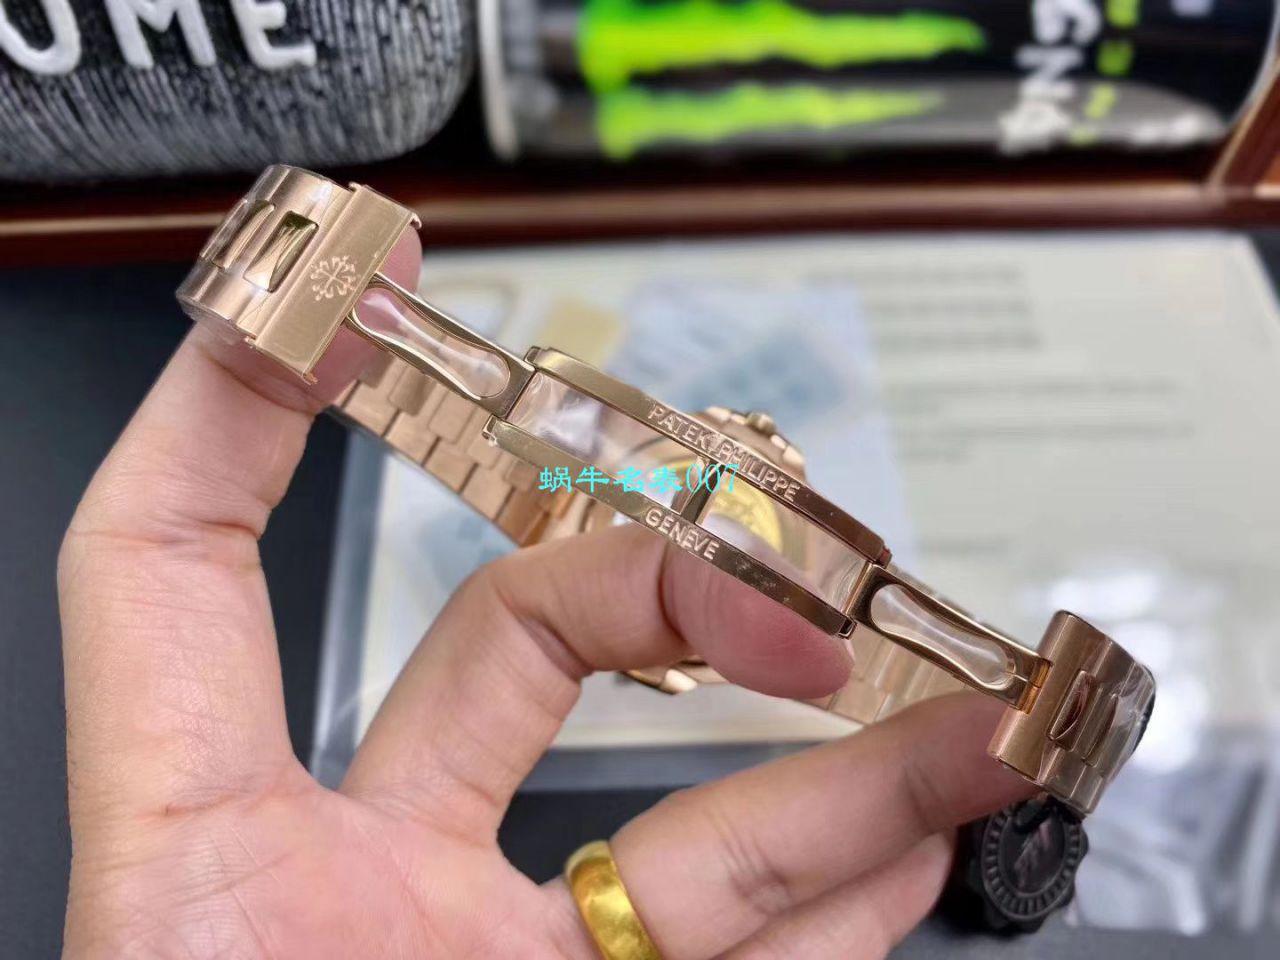 【PPF厂鹦鹉螺复刻最好版本手表V2价格】百达翡丽运动系列5711/1R-001腕表